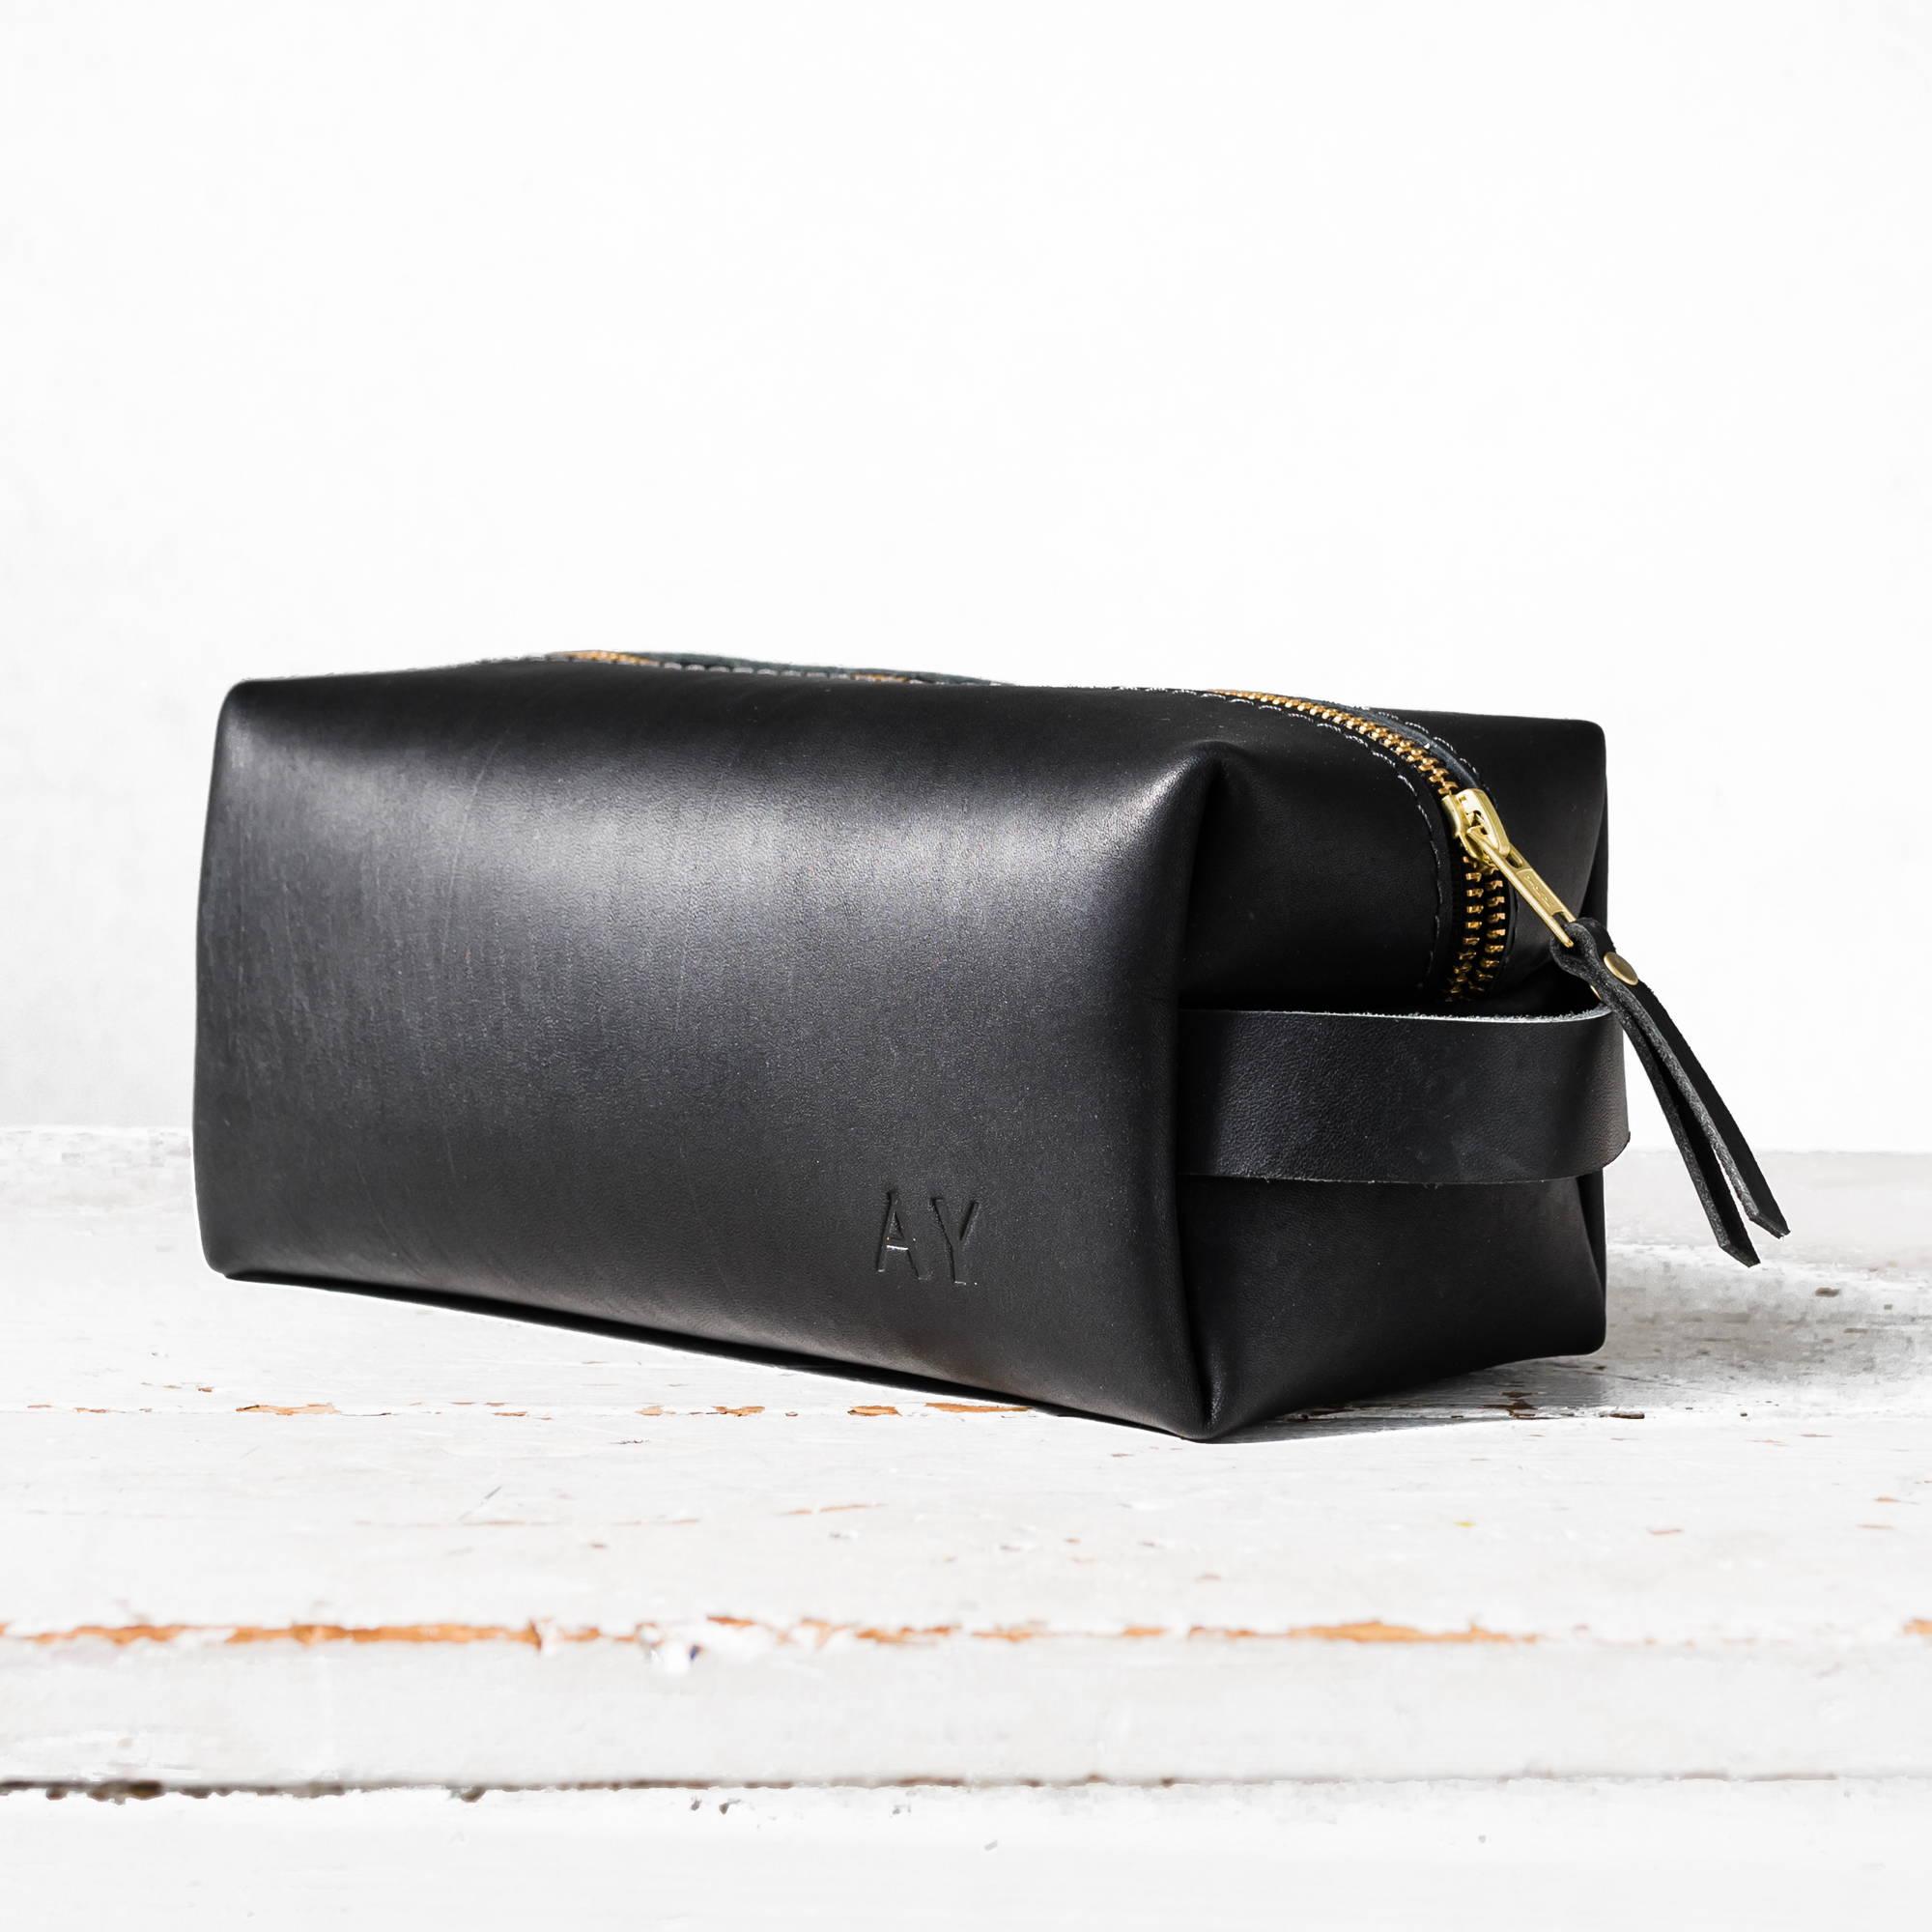 695a02fcb868 black handmade leather dopp kit by portland leather goods